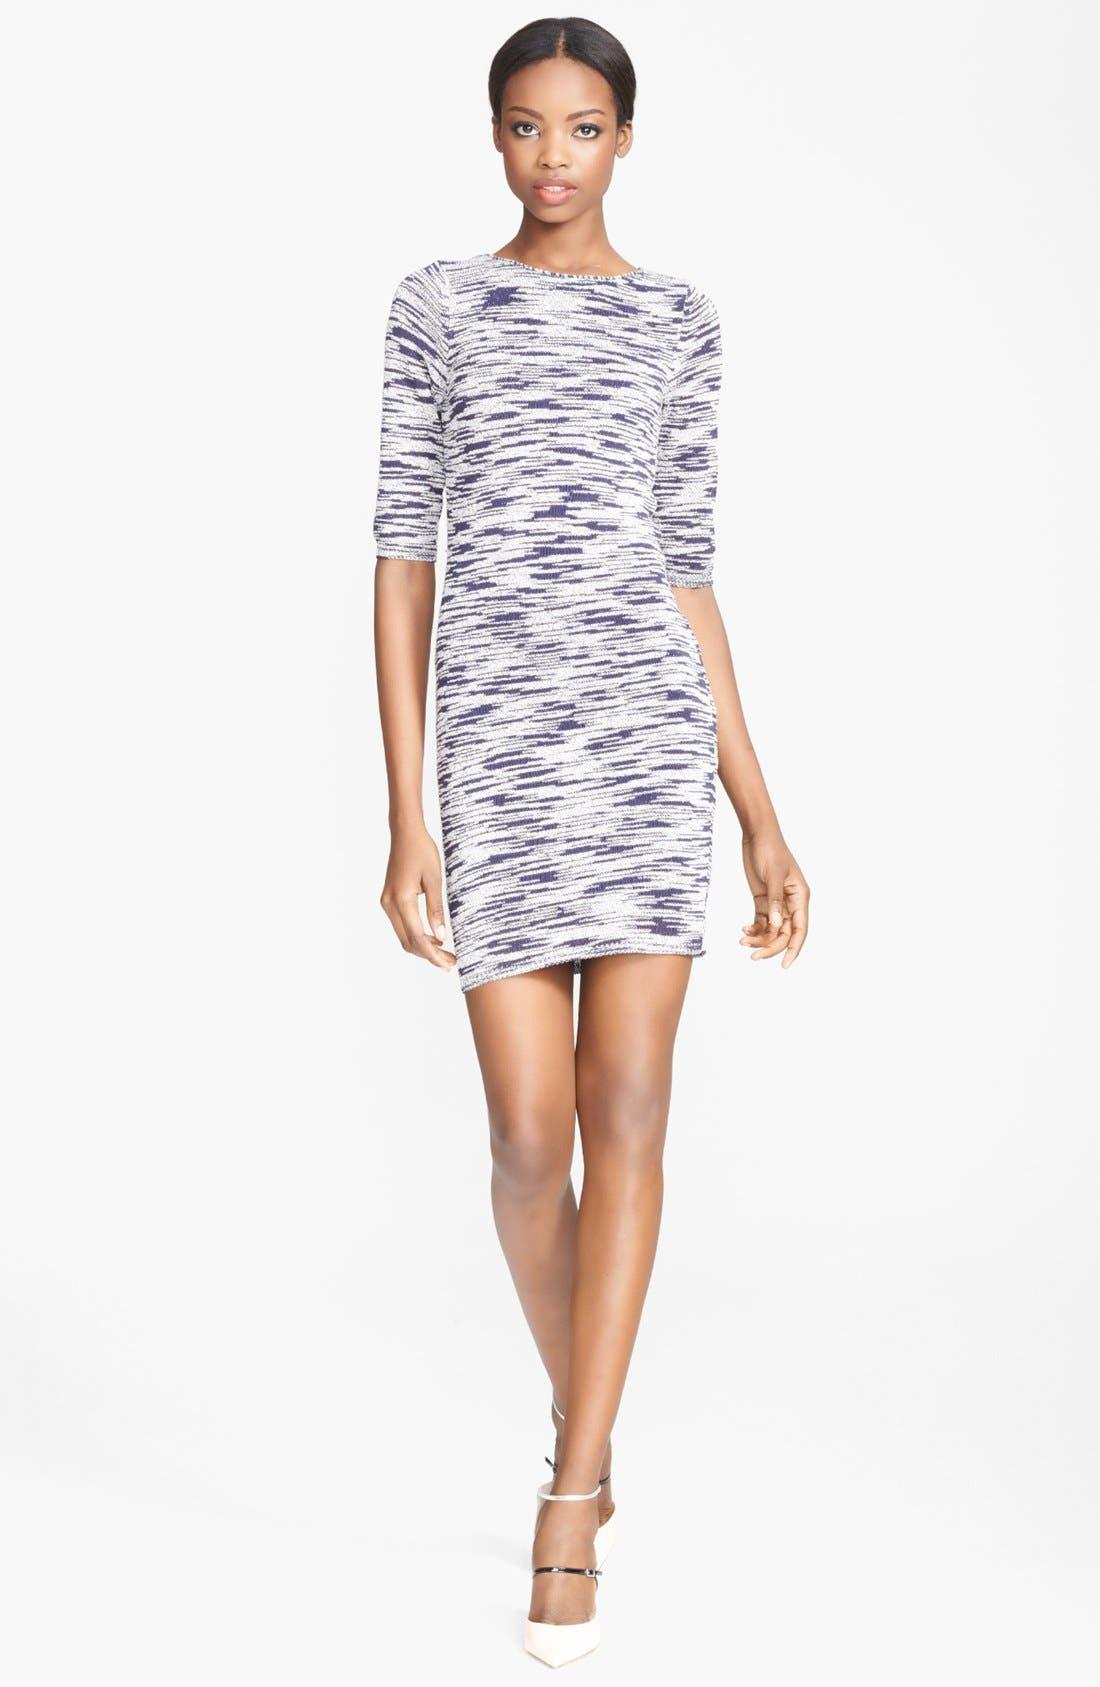 Alternate Image 1 Selected - Alice + Olivia Textured Sweater Dress